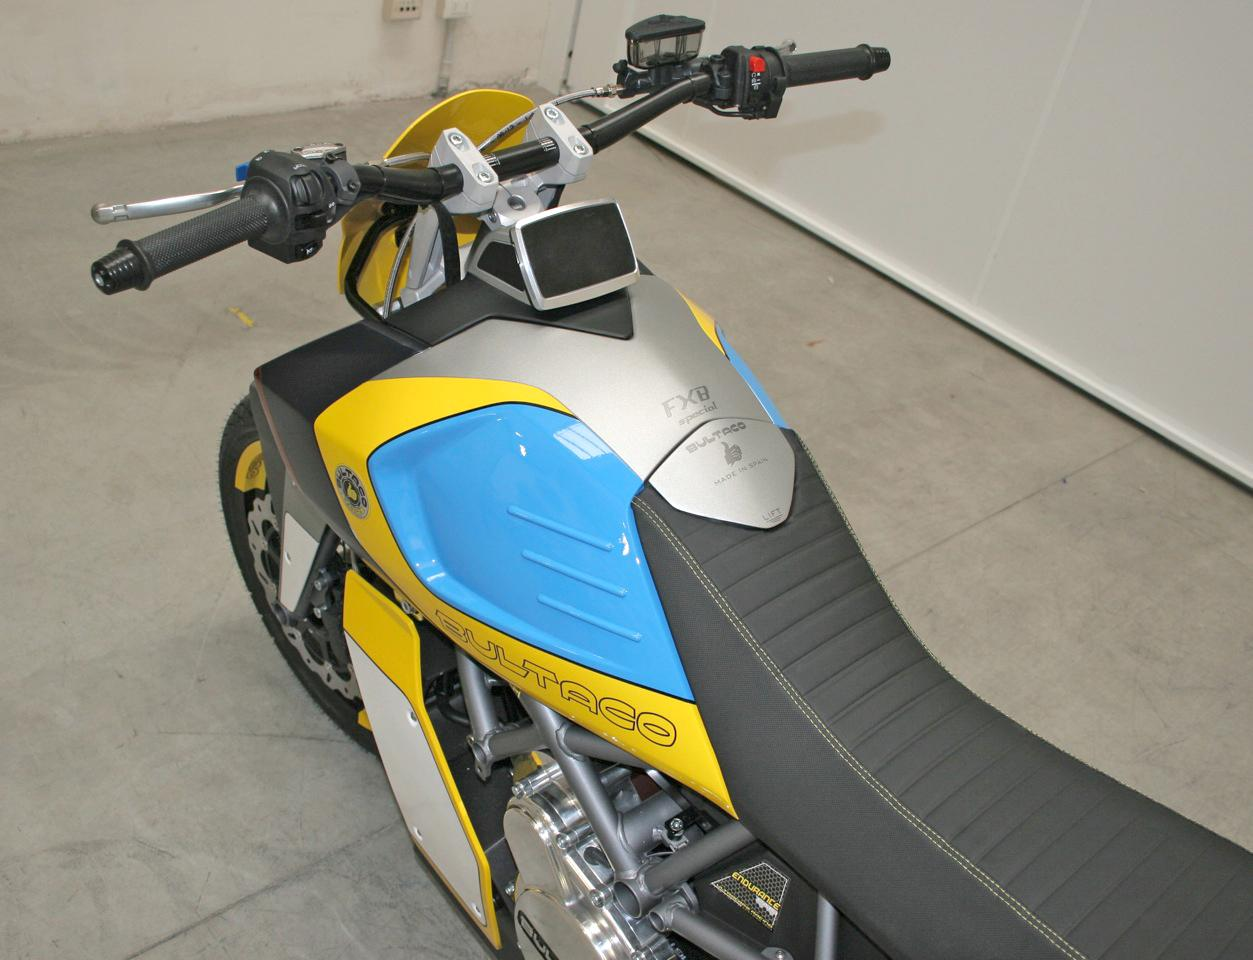 The all-electric Bultaco Rapitan Sport